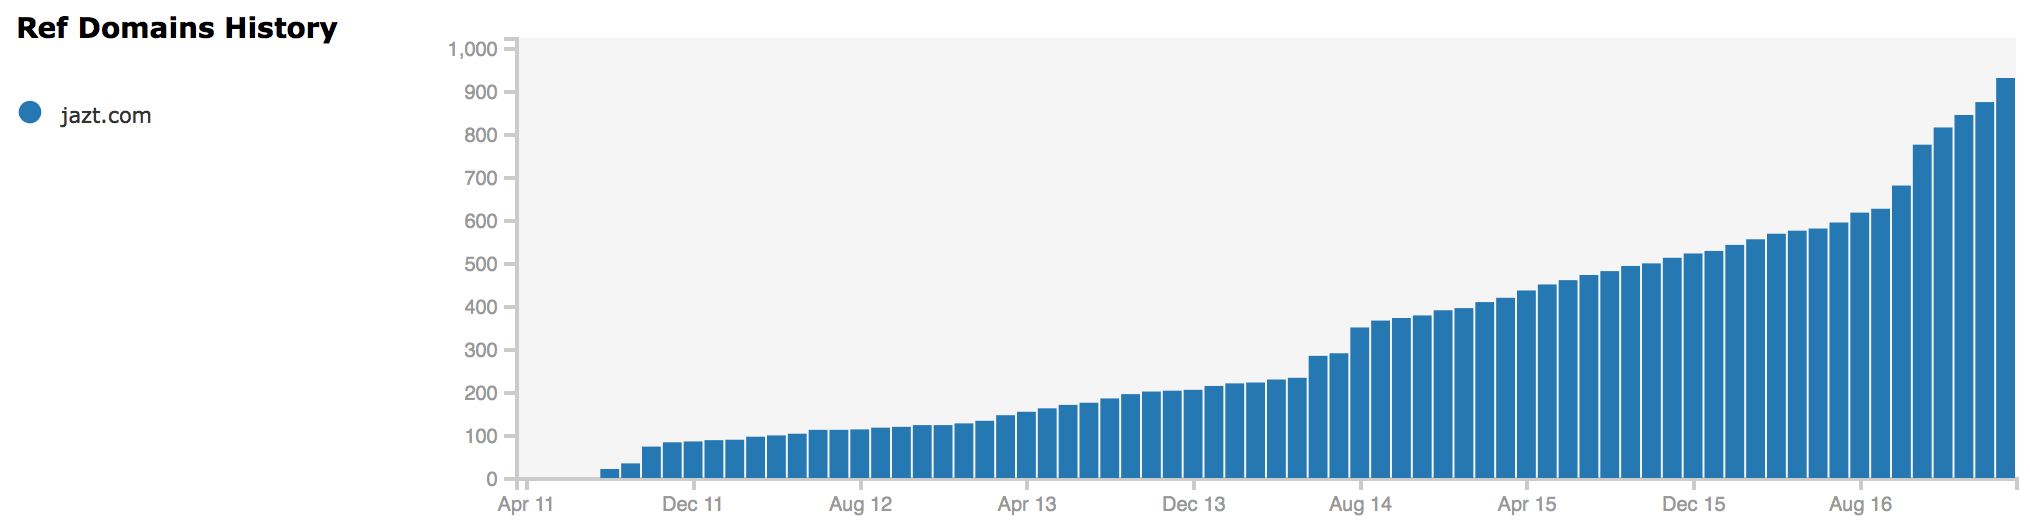 Evolution de popularité de Jazt.com